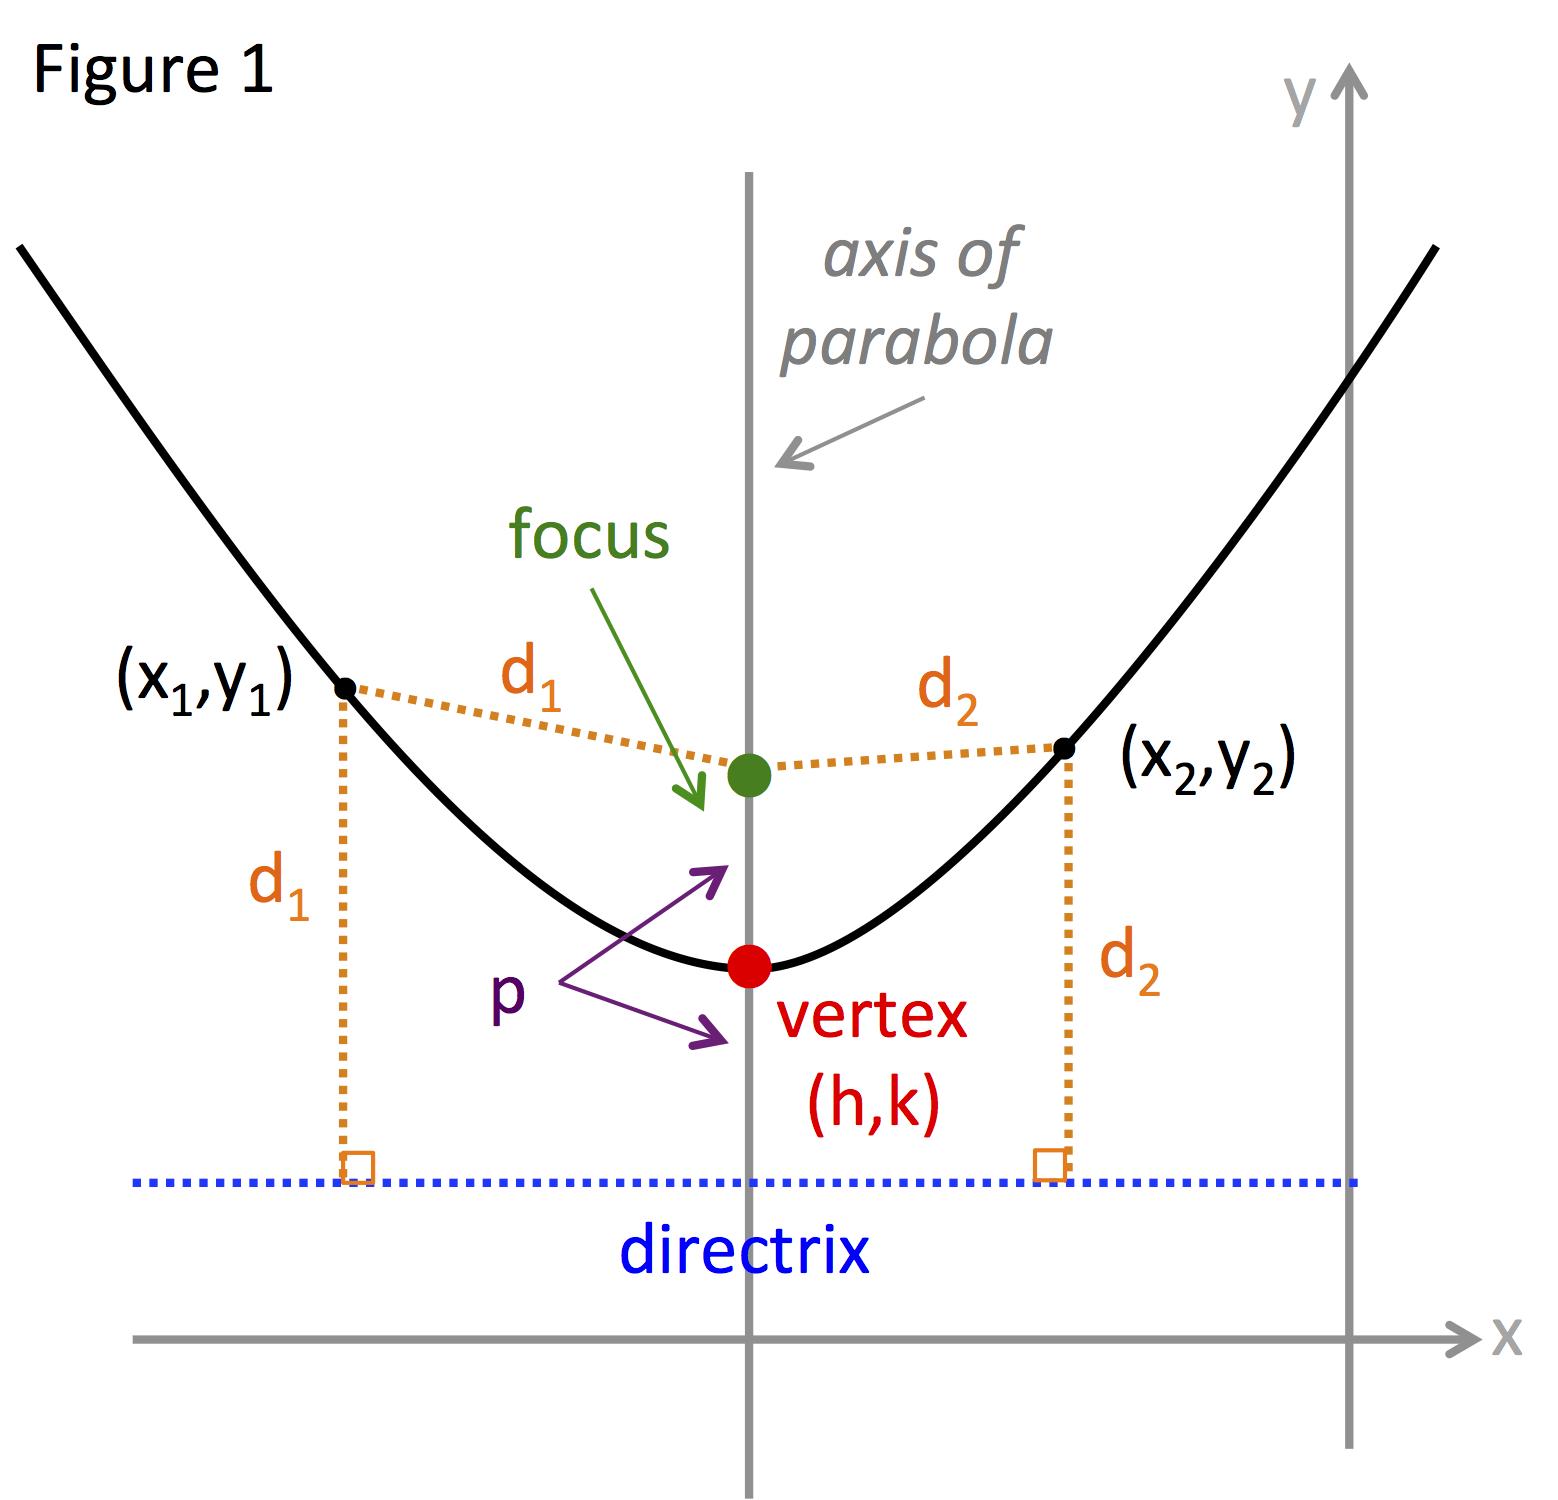 Determining the focal length of a parabolic dish (axi-symmetric, circular)